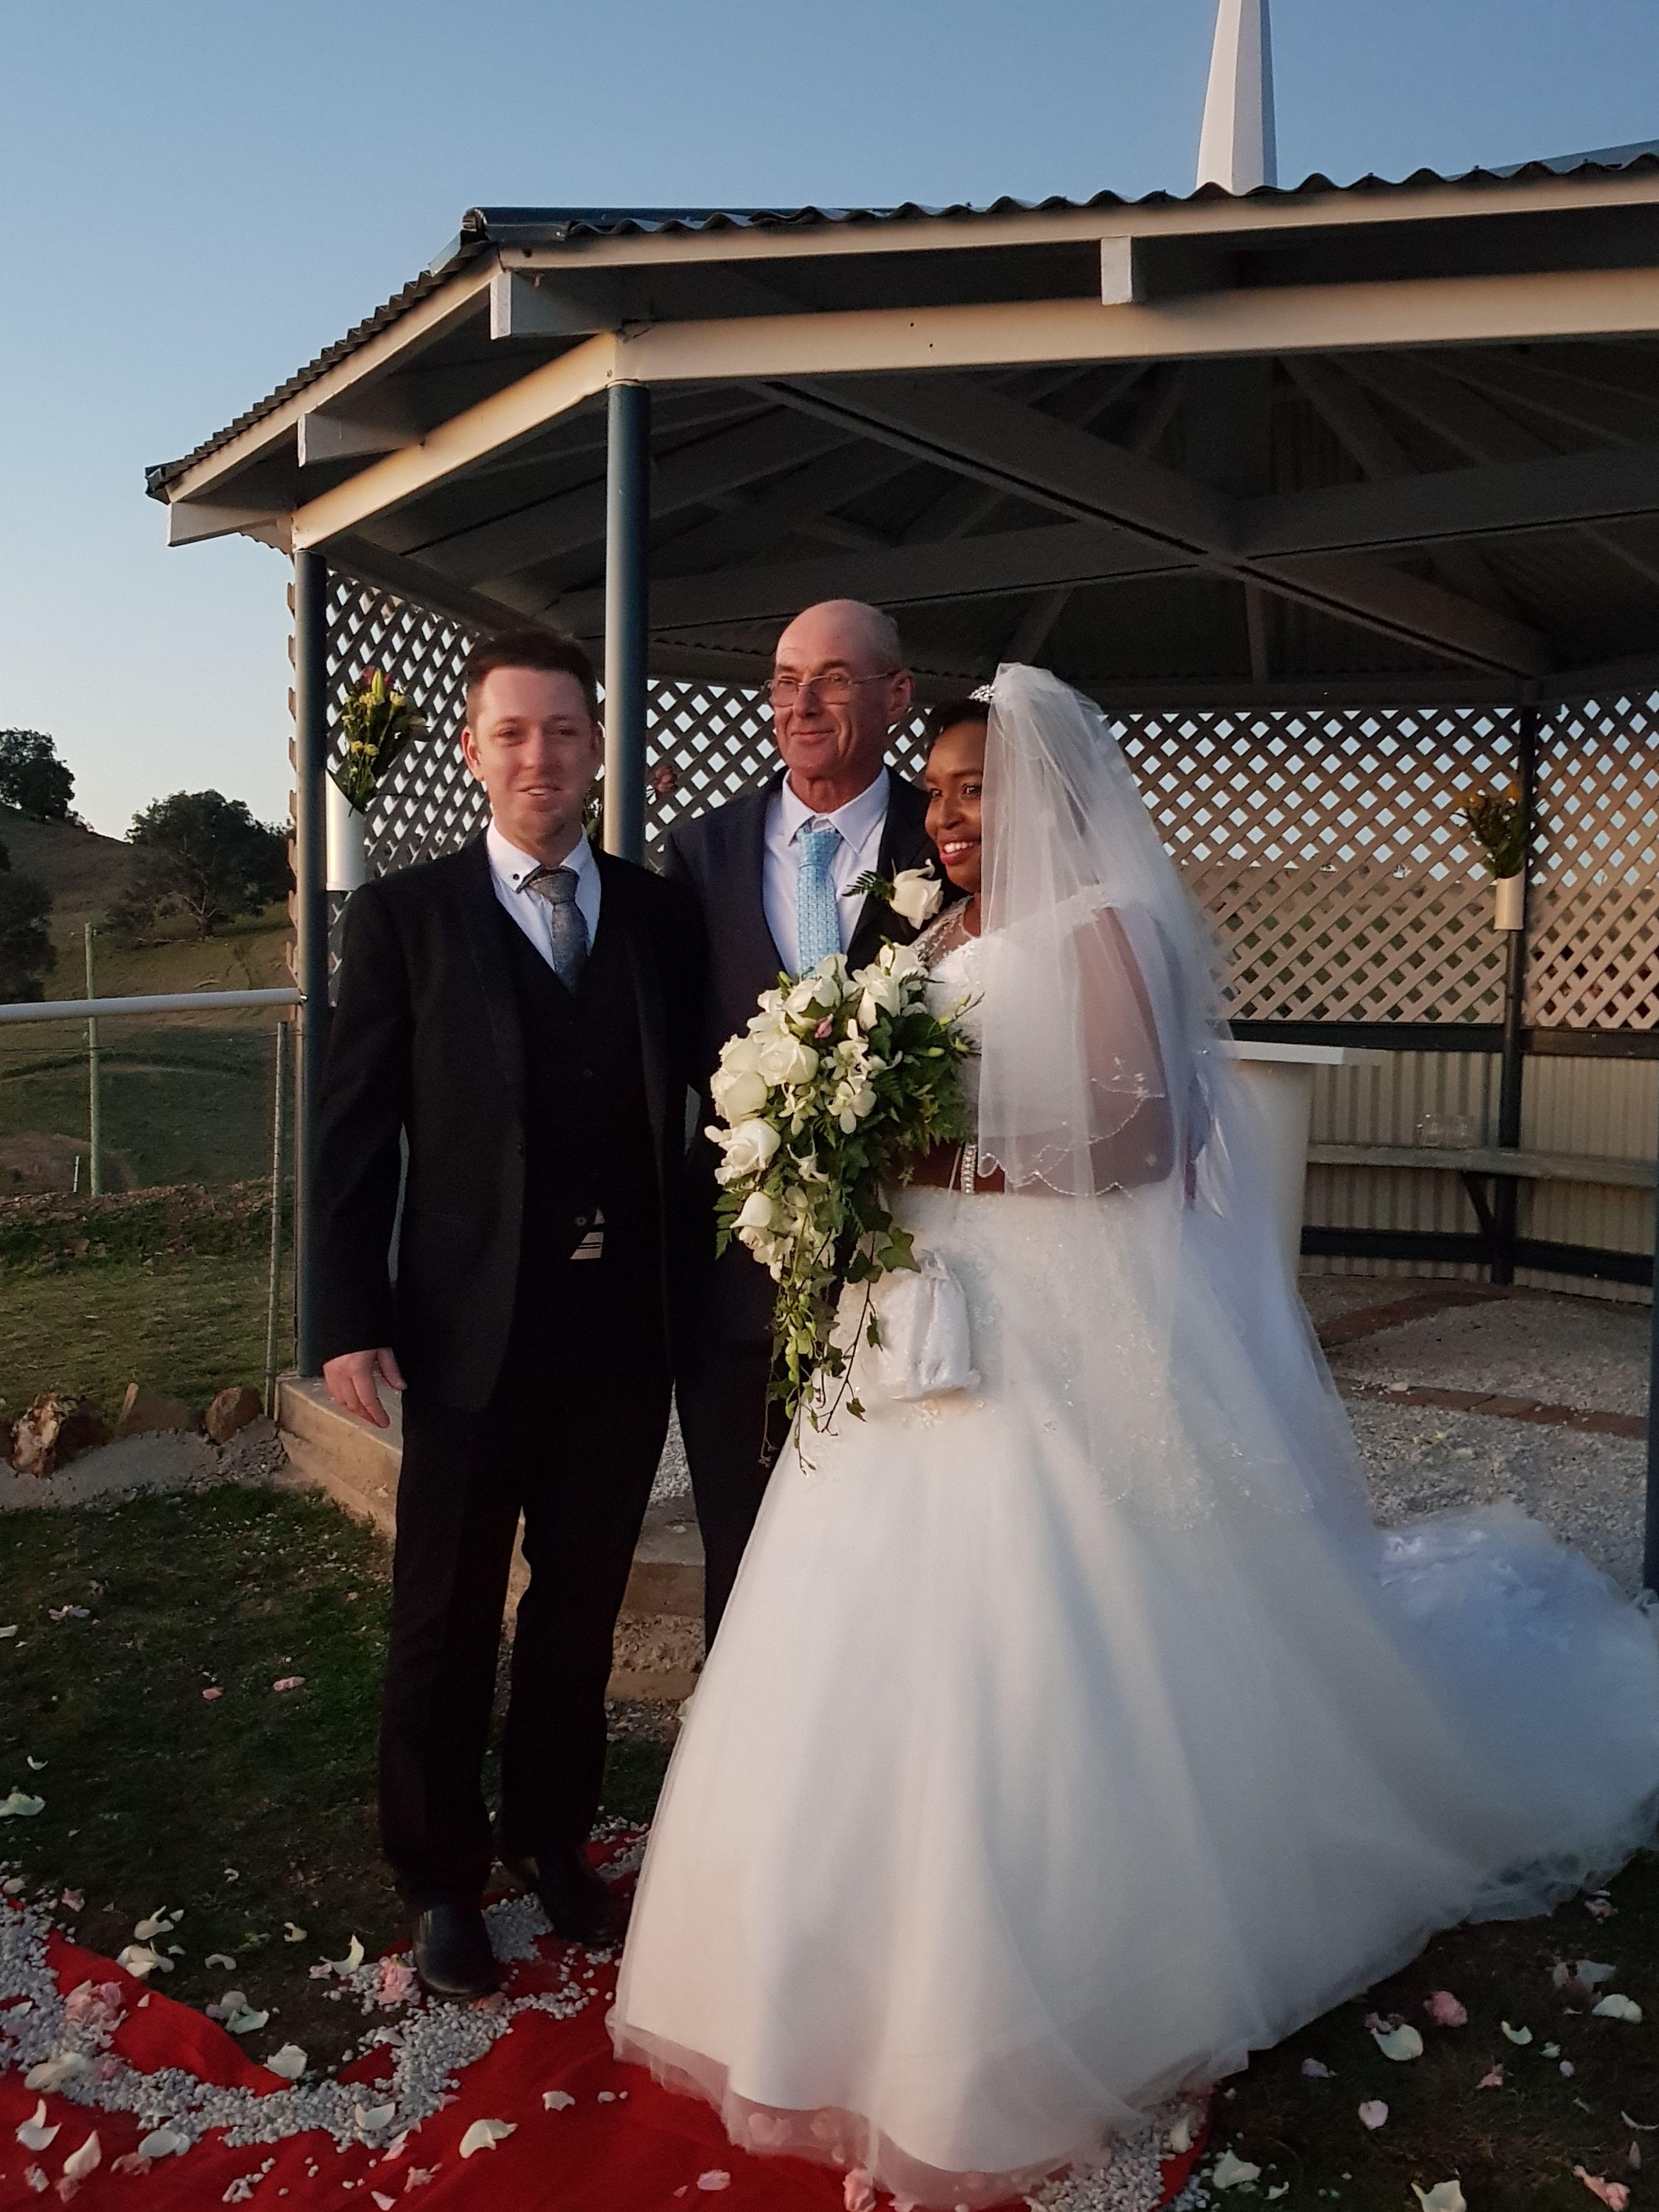 Wedding Ceremony, Sunset Ceremony, Celebrant, Sydney Celebrant, Sydney Marriage Celebrant, Hawkesbury Celebrant, The Hills Marriage Celebrant, Customised Wedding Ceremony